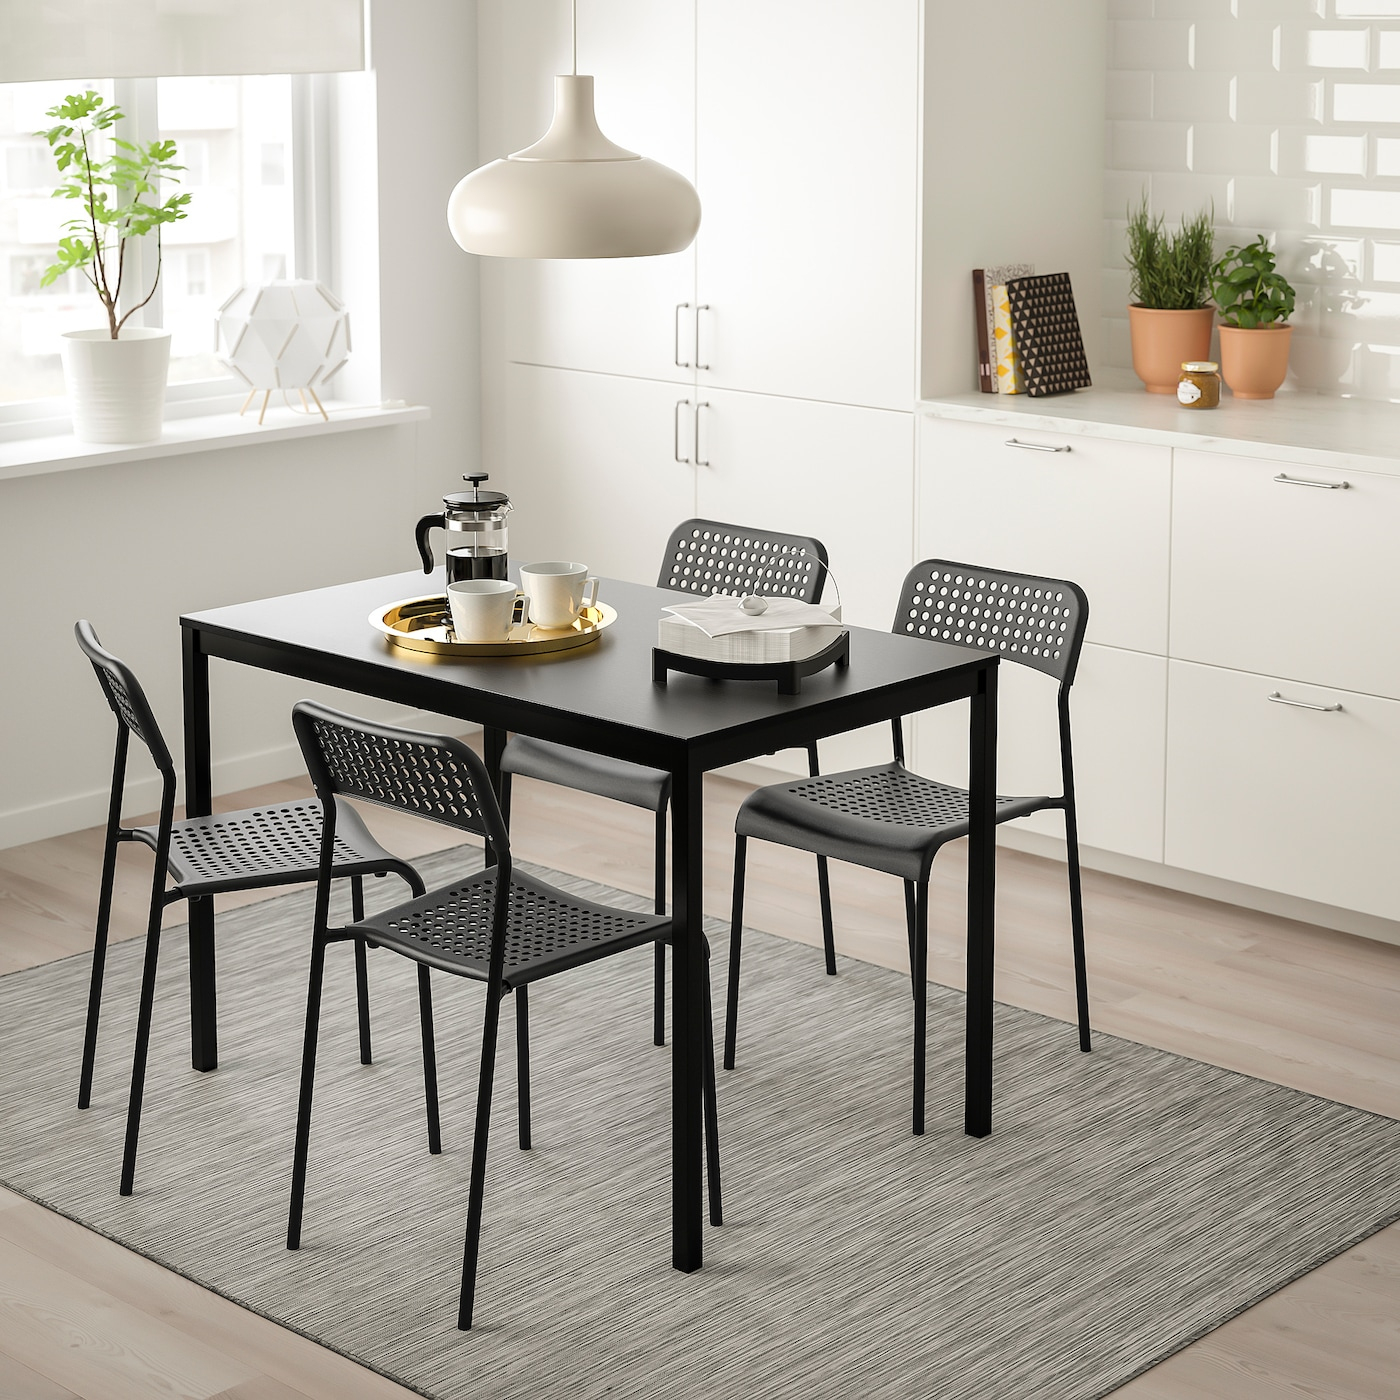 Tärendö / Adde Table And 4 Chairs - Black, Black 110X67 Cm serapportantà Tables Salle À Manger Ikea